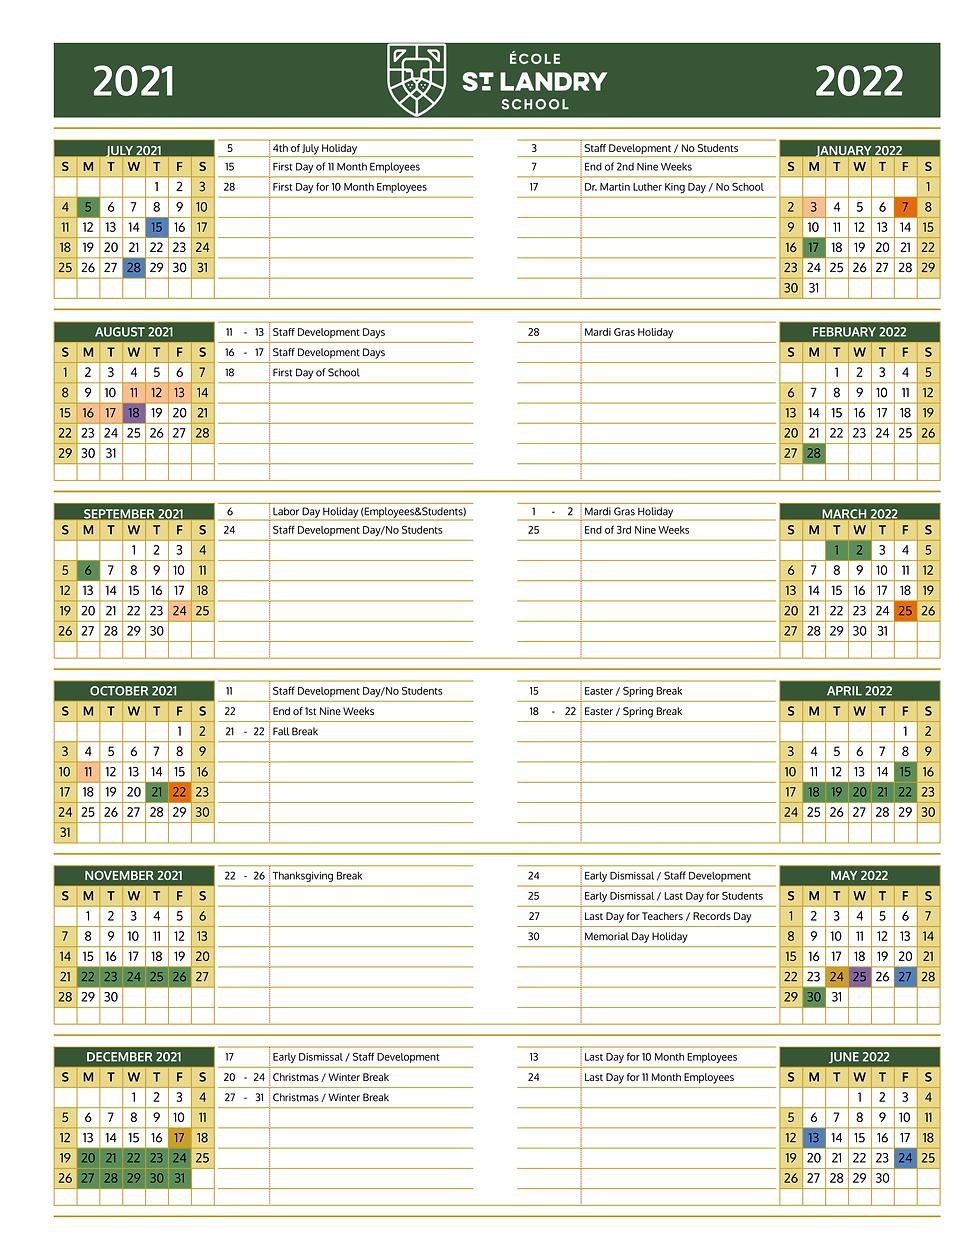 Academic Calendar 2122 - Calendar2122 (3)-1.png